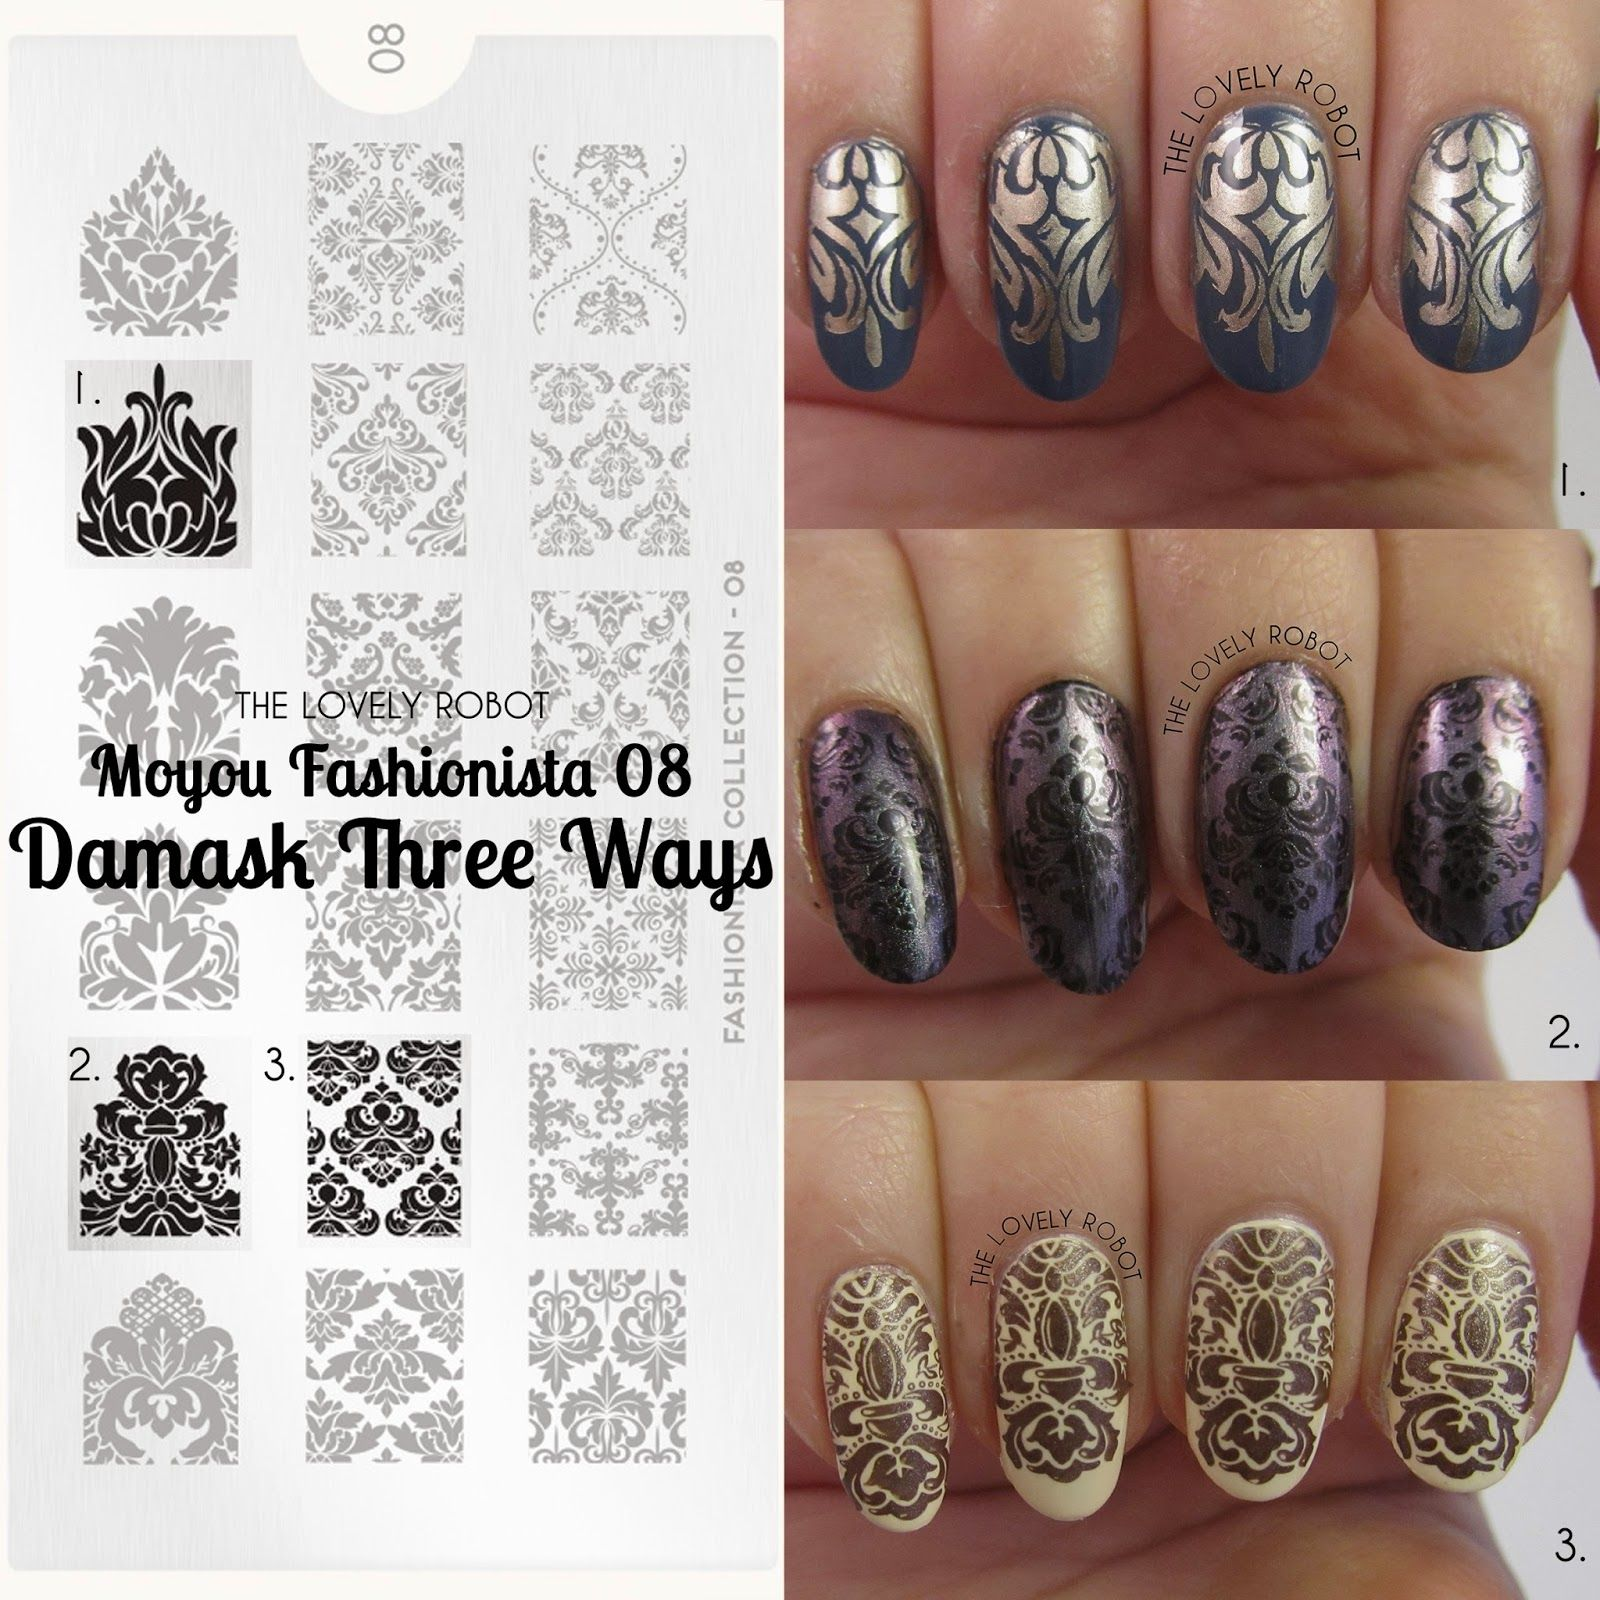 MoYou Fashionista 08 - Damask three ways! Stamping Nail Art   Makeup ...